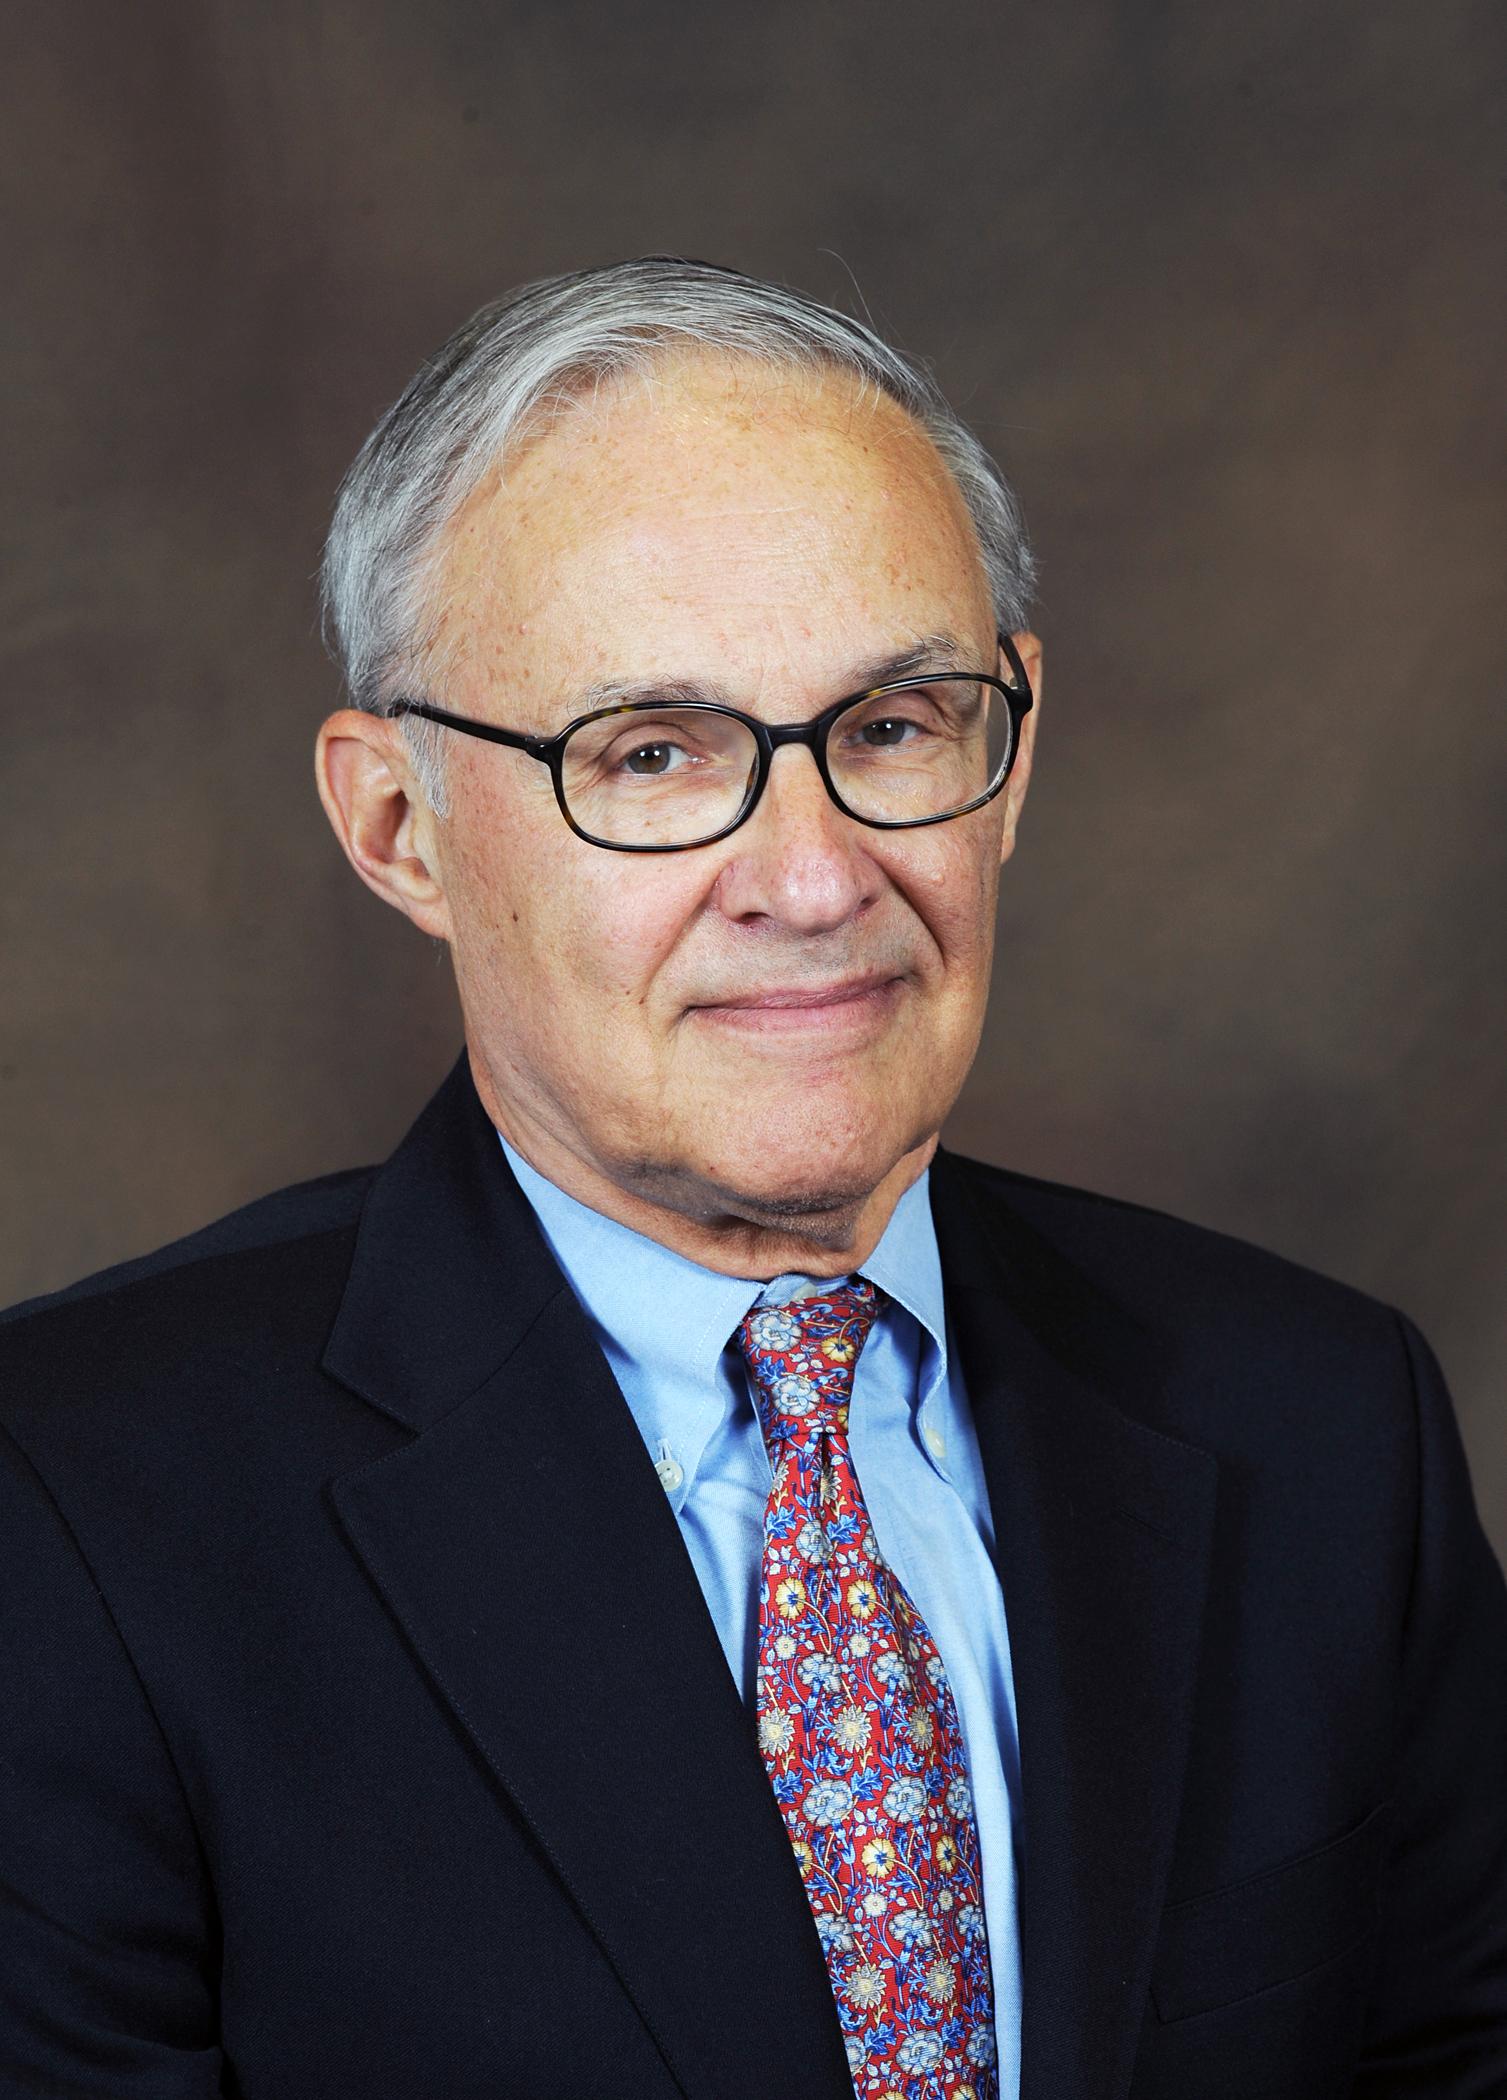 Leon R. Kass M.D. | C-SPAN.org